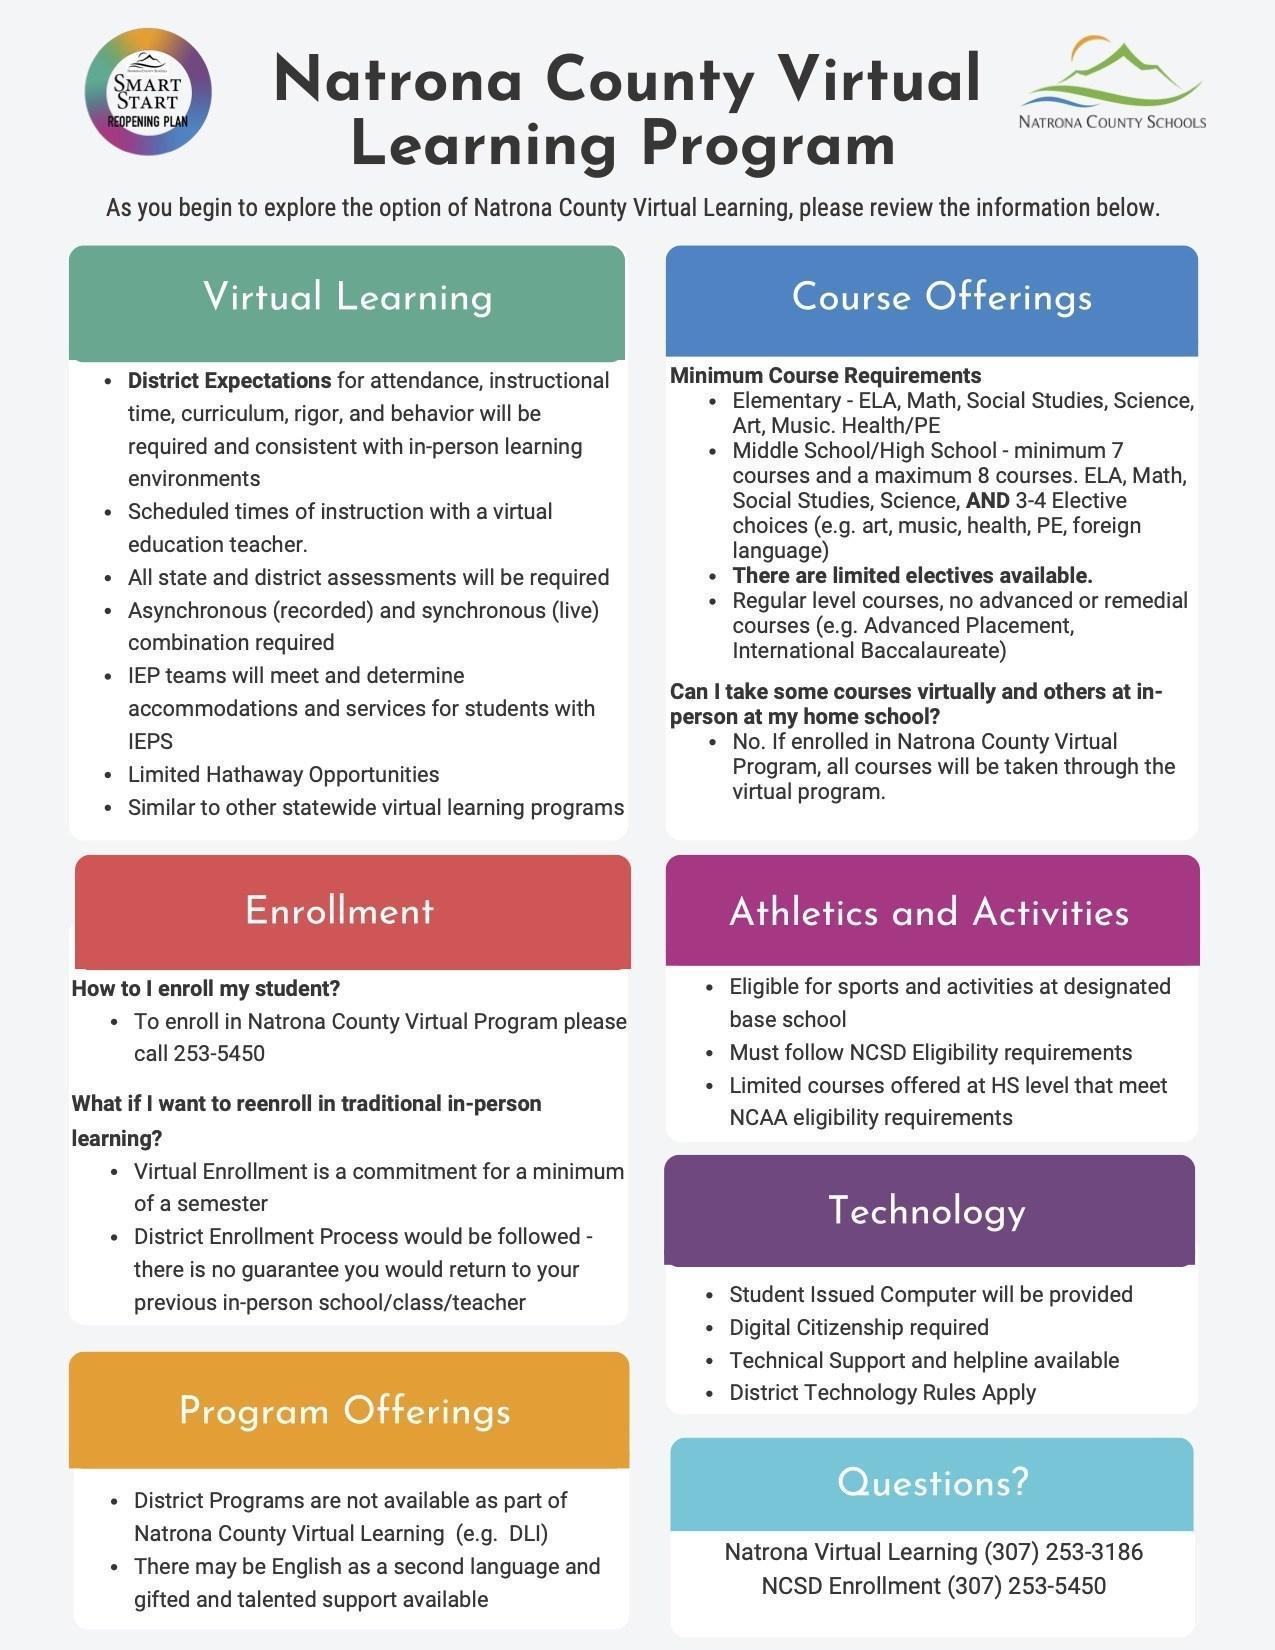 Natrona County Virtual Learning Program informational flyer